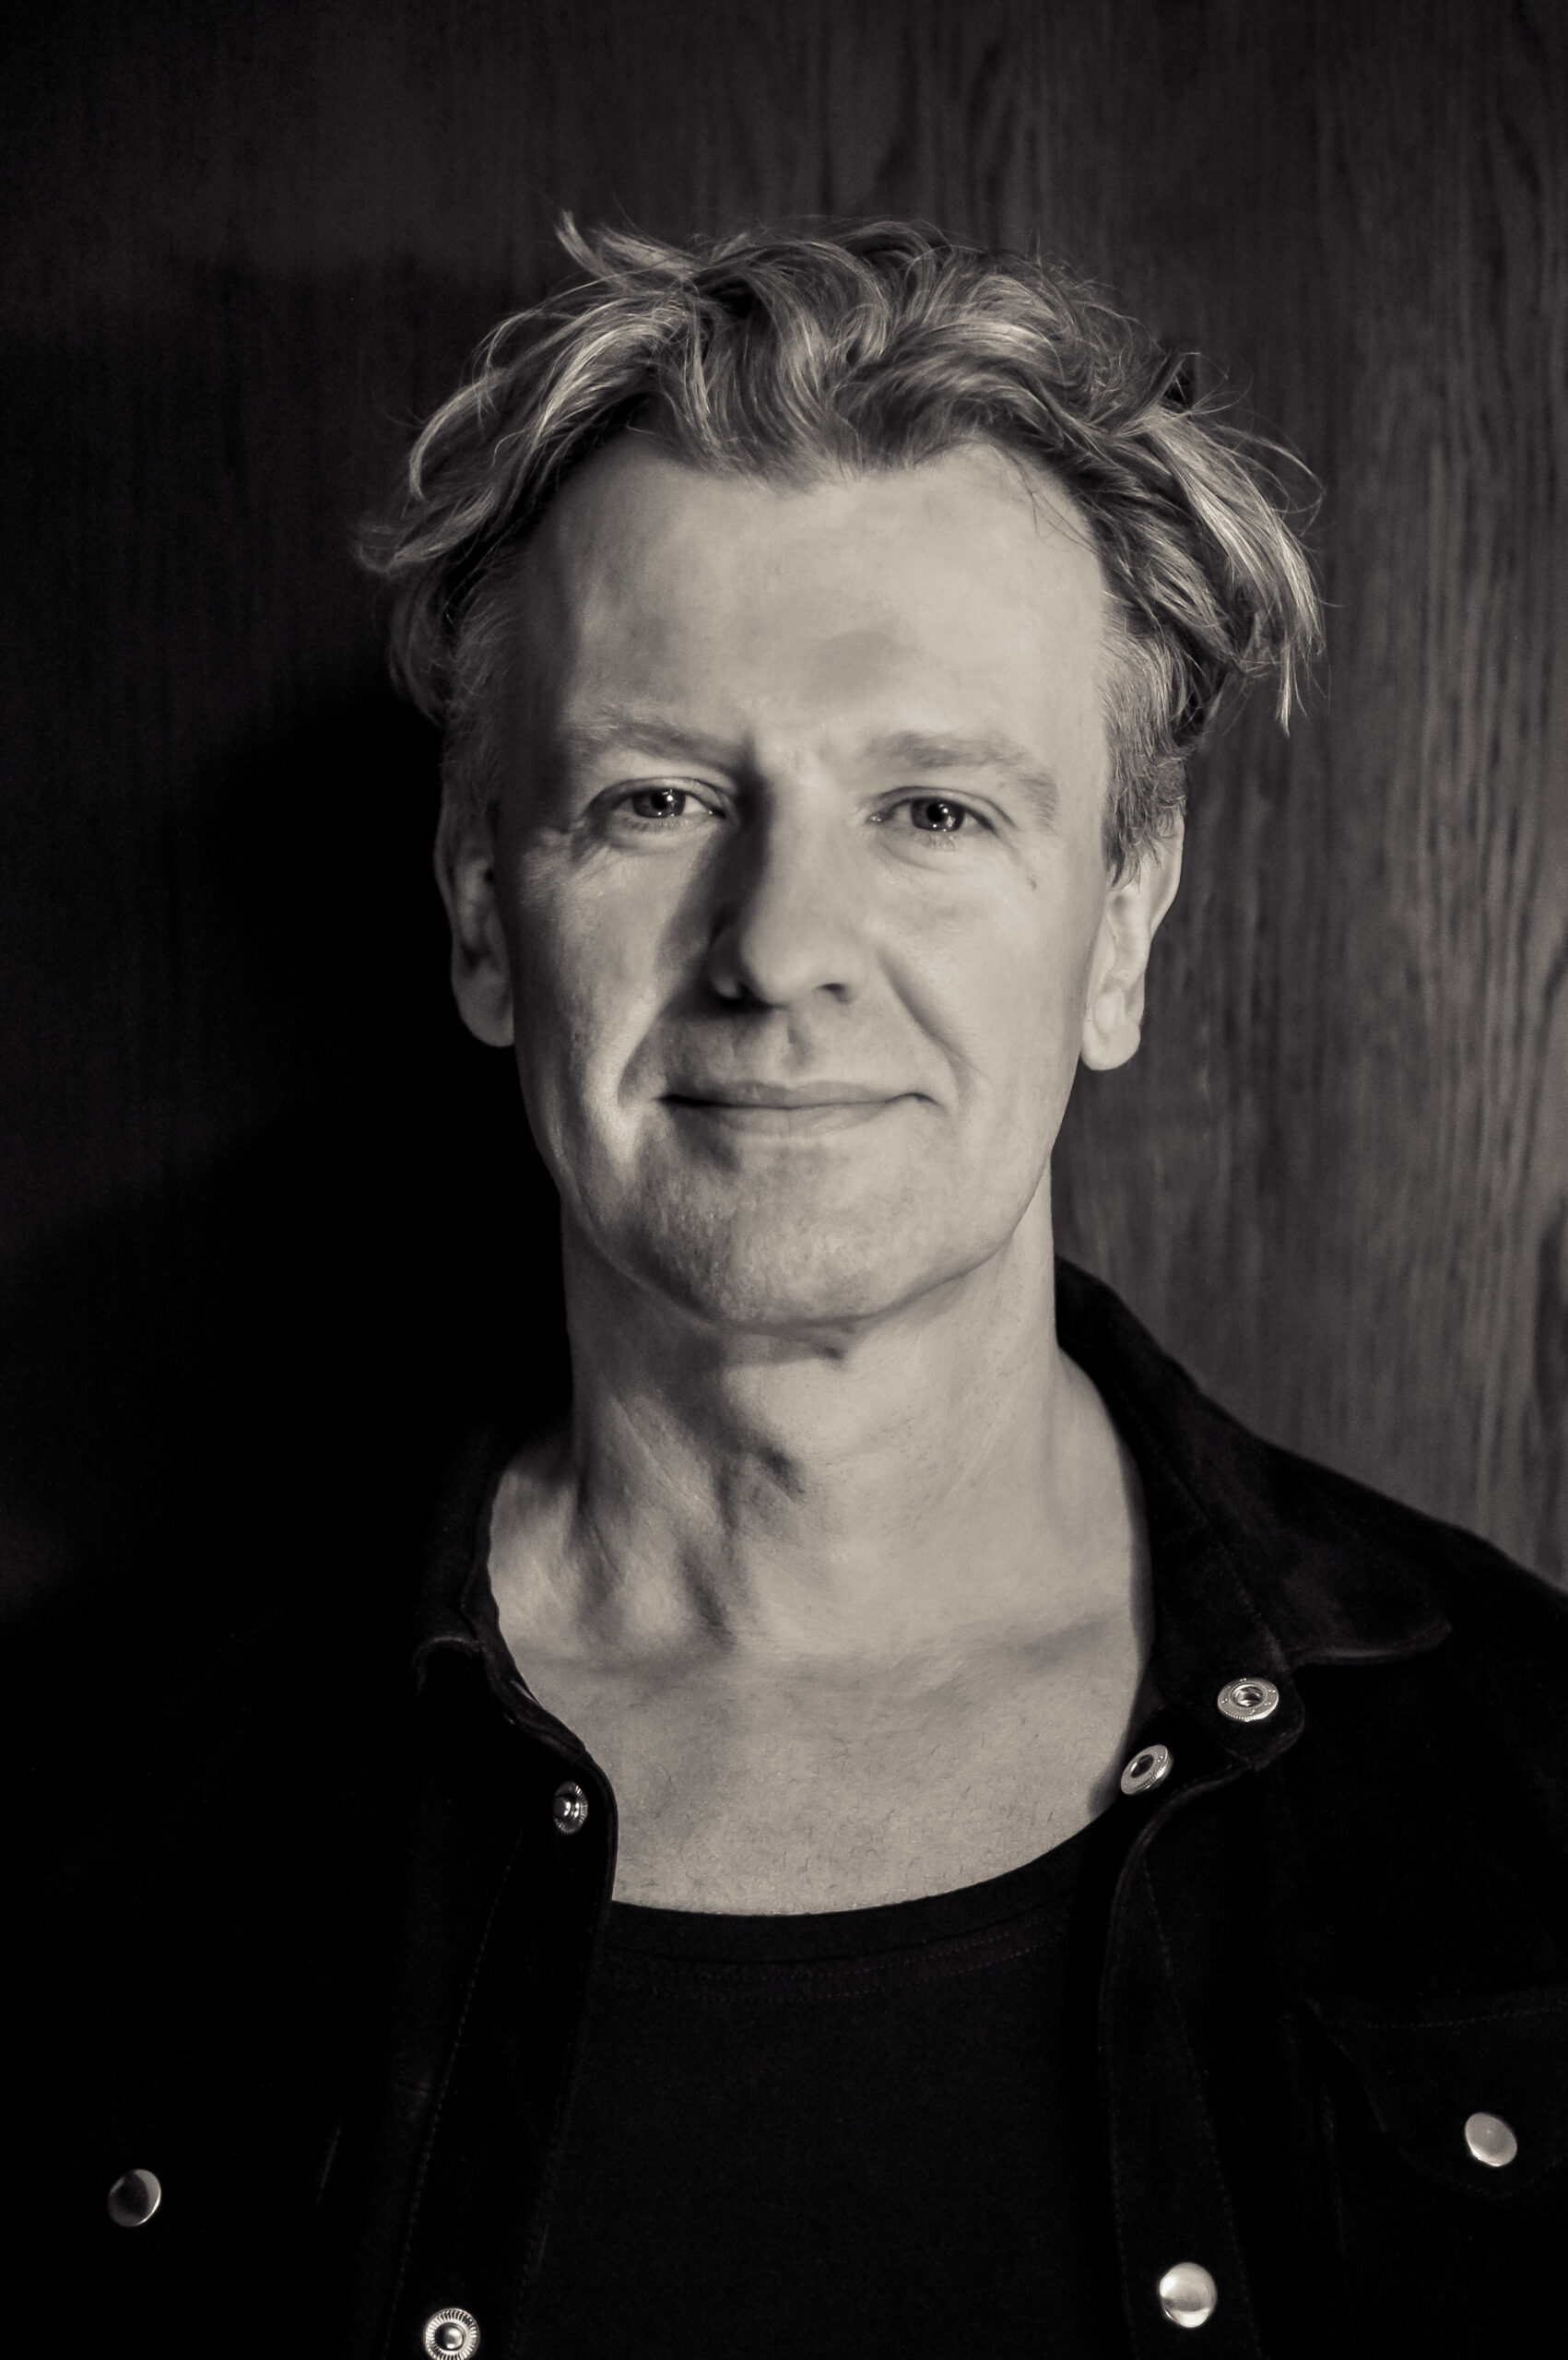 jeroen-de-nijs-portret-2020jeroen-de-nijs-portret-2020